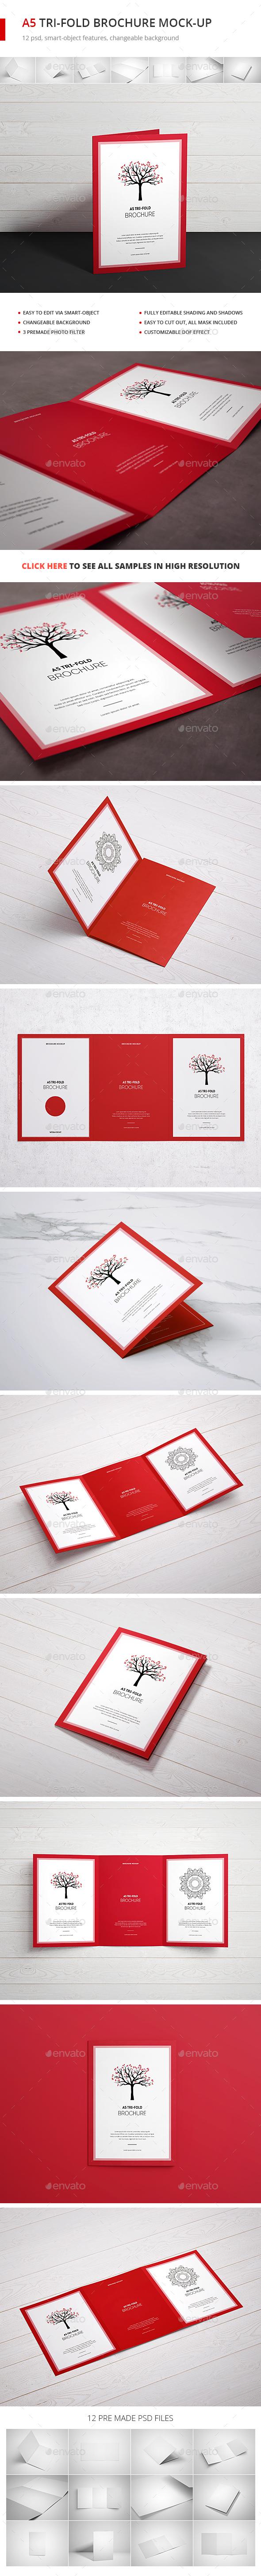 Tri-Fold Brochure A5 Mock-up - Brochures Print